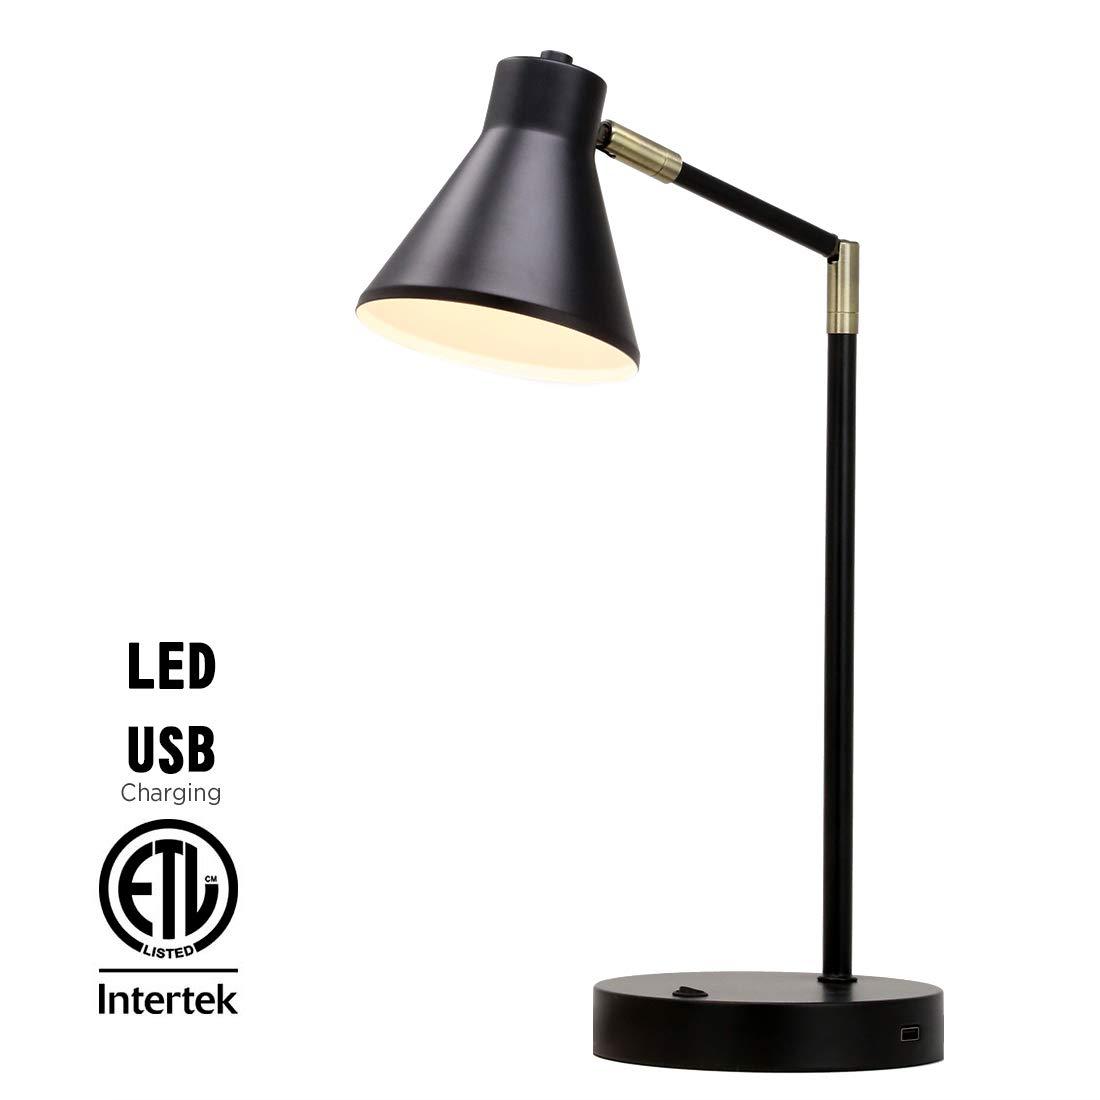 O'Bright LED Desk Lamp with USB Charging Port, 100% Metal Lamp, 270° Flexible Swivel Arms, Soft White LED Reading Light (3000K), Bedside Reading Lamp, Office Lamp, Table Lamp, ETL Listed, Black